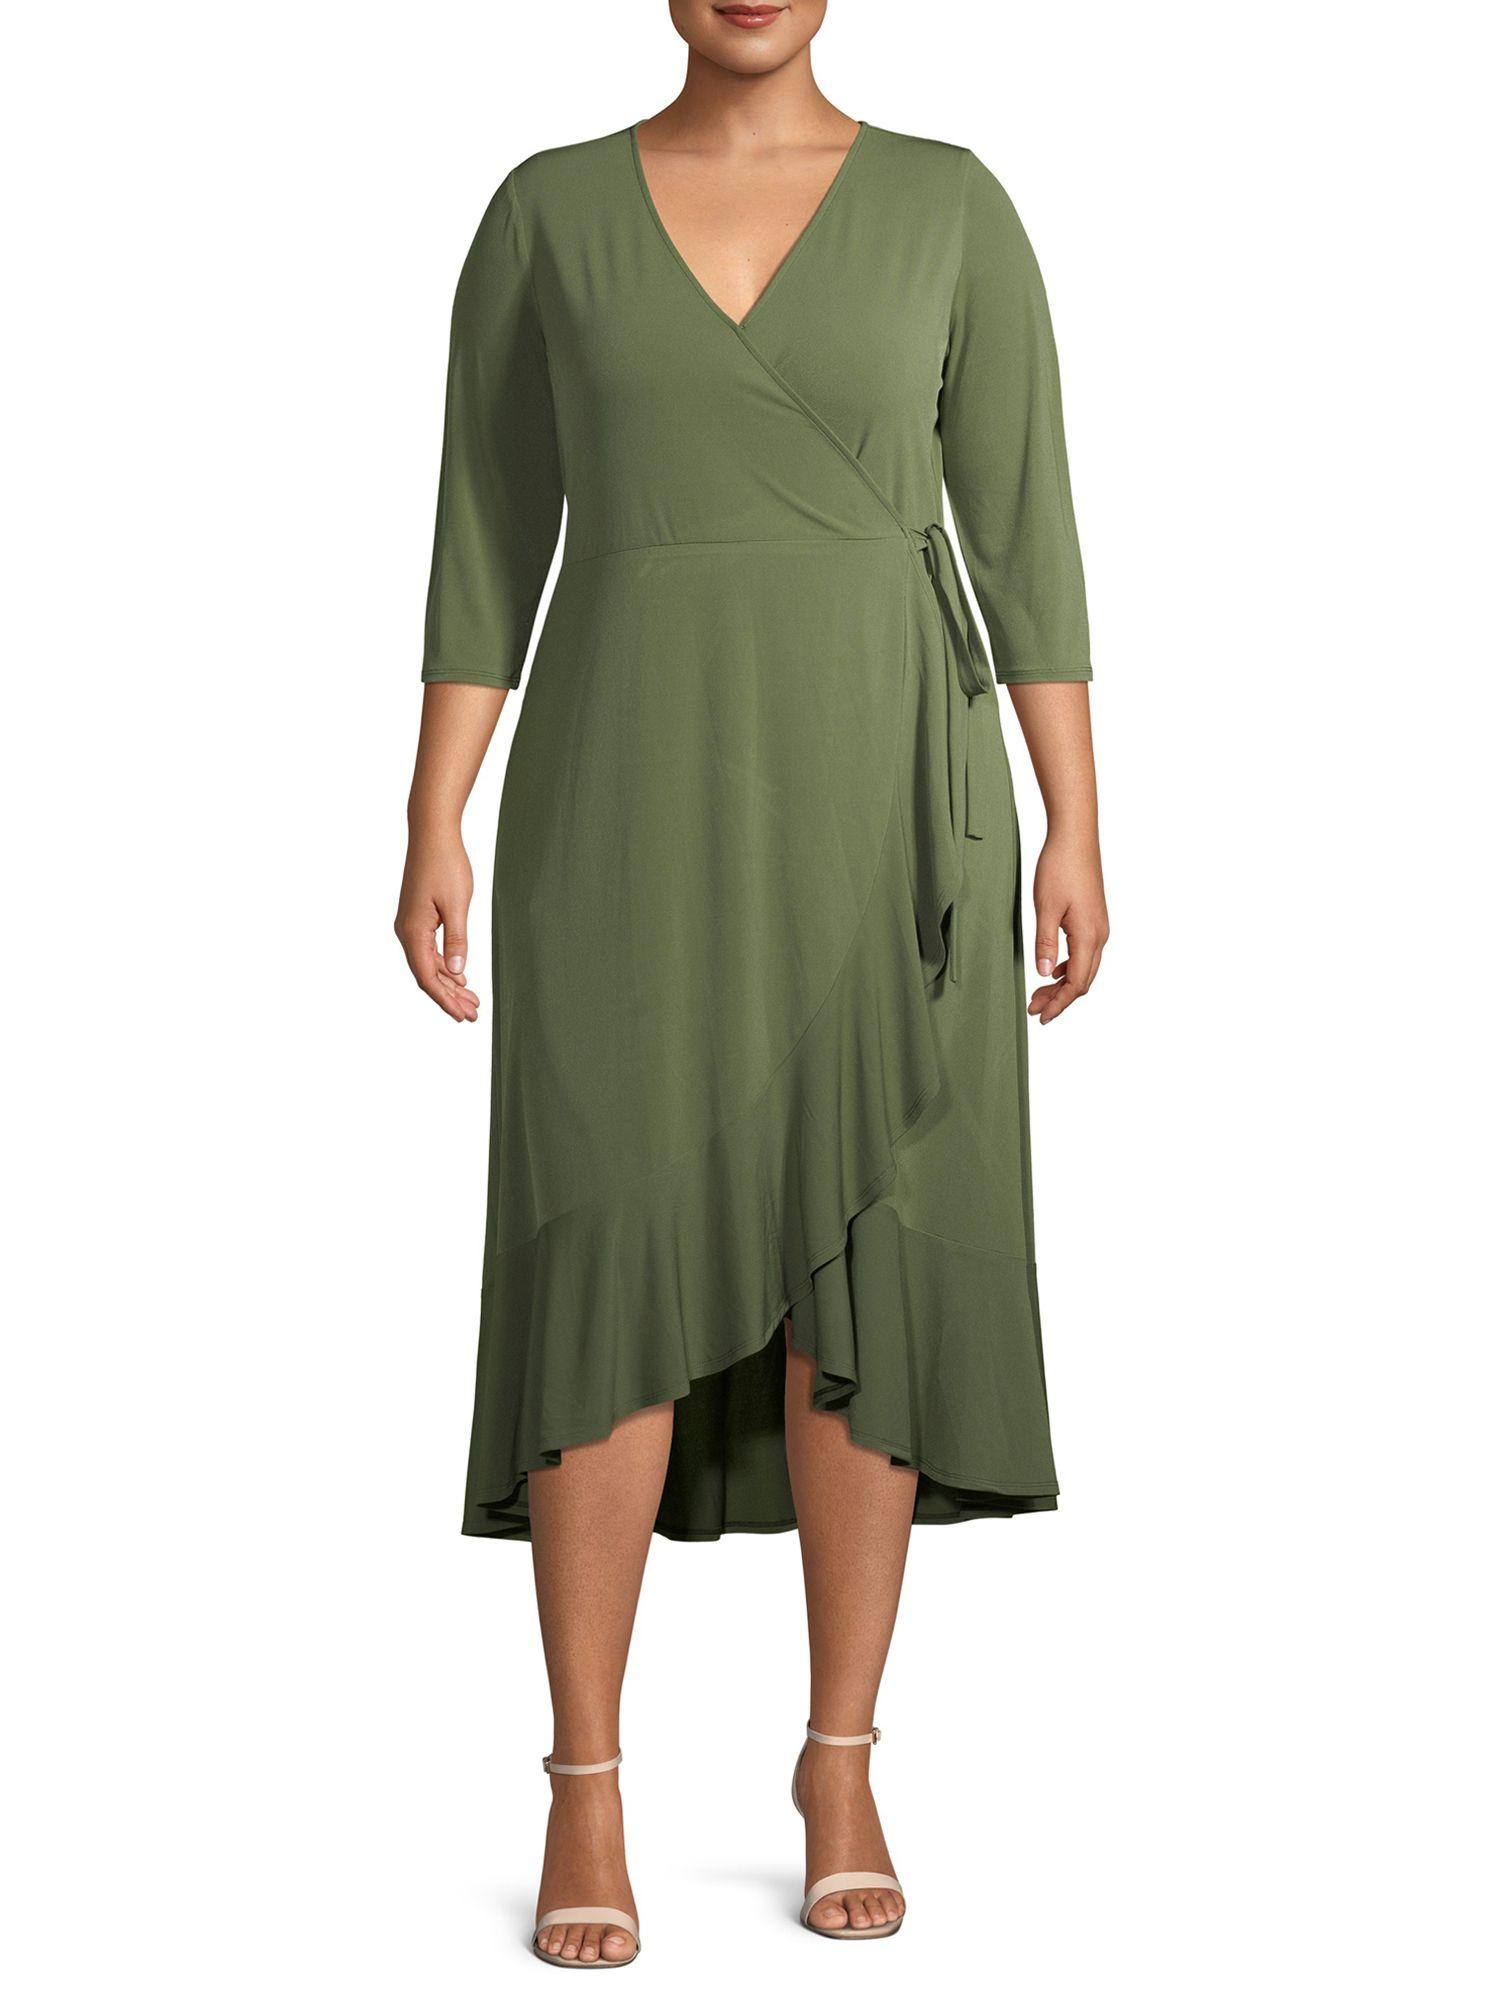 Terra Sky Terra Sky Women S Plus Size Solid Wrap Dress With Ruffle Detail Walmart Com Wrap Dress Sky Clothing Dresses [ 2000 x 1500 Pixel ]